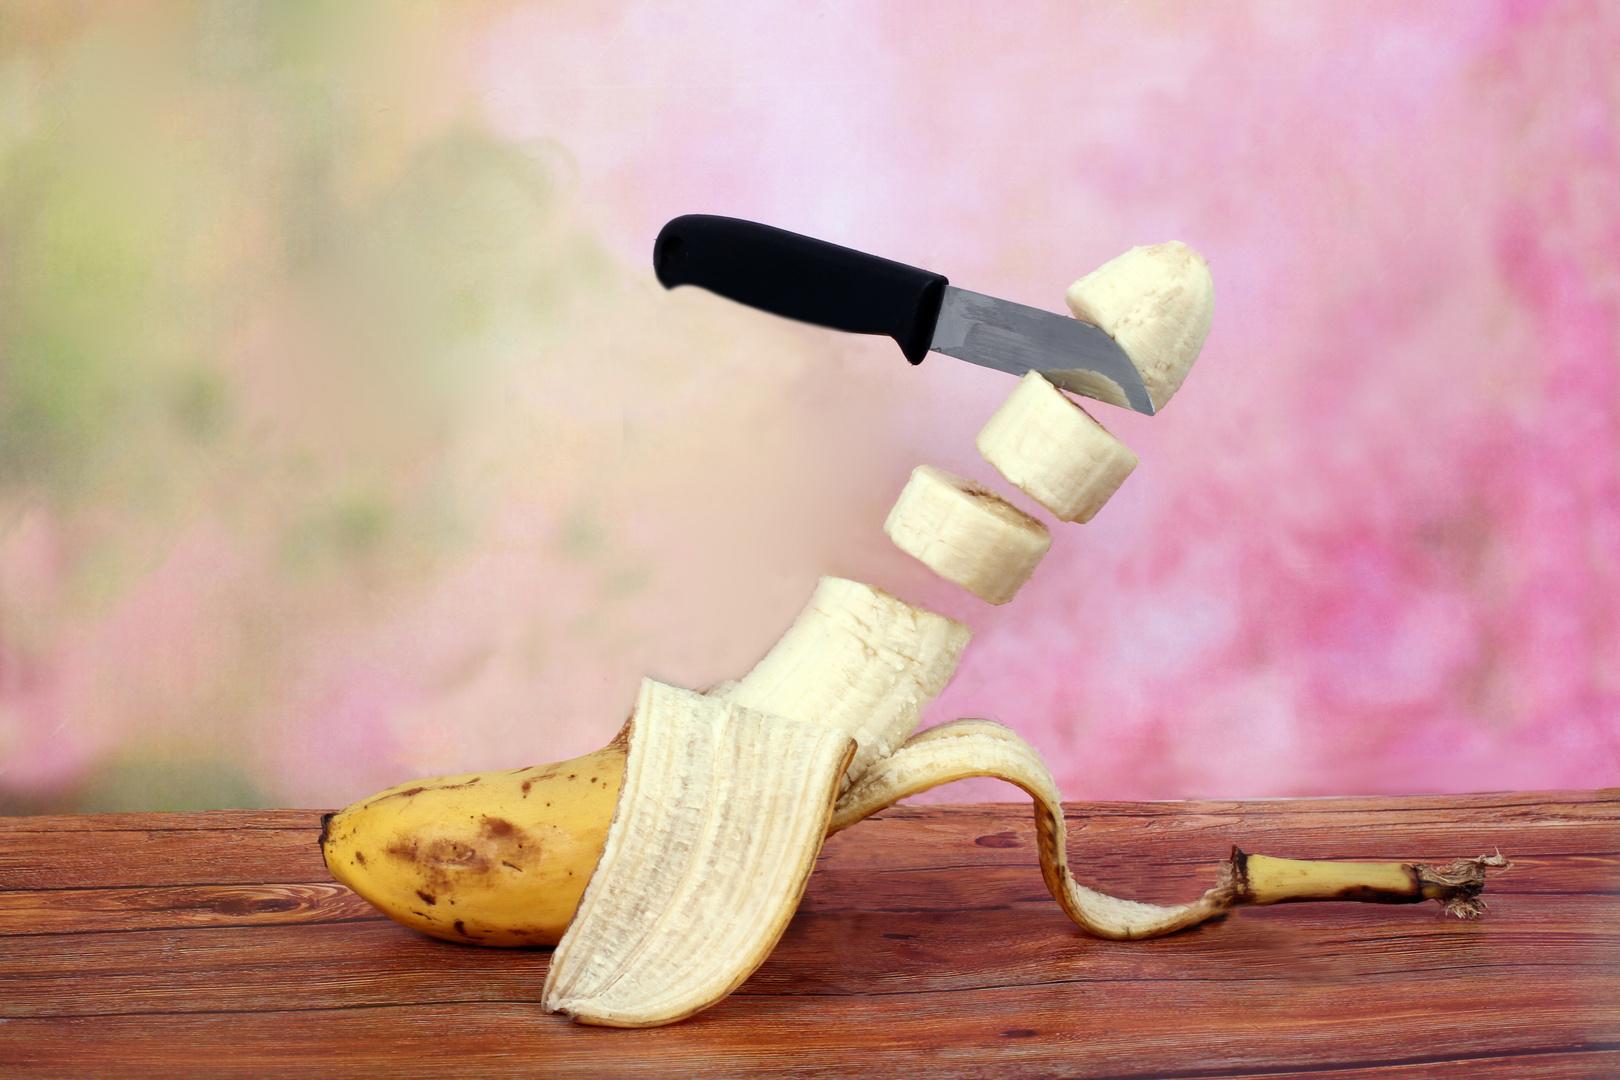 Schwebende Banane